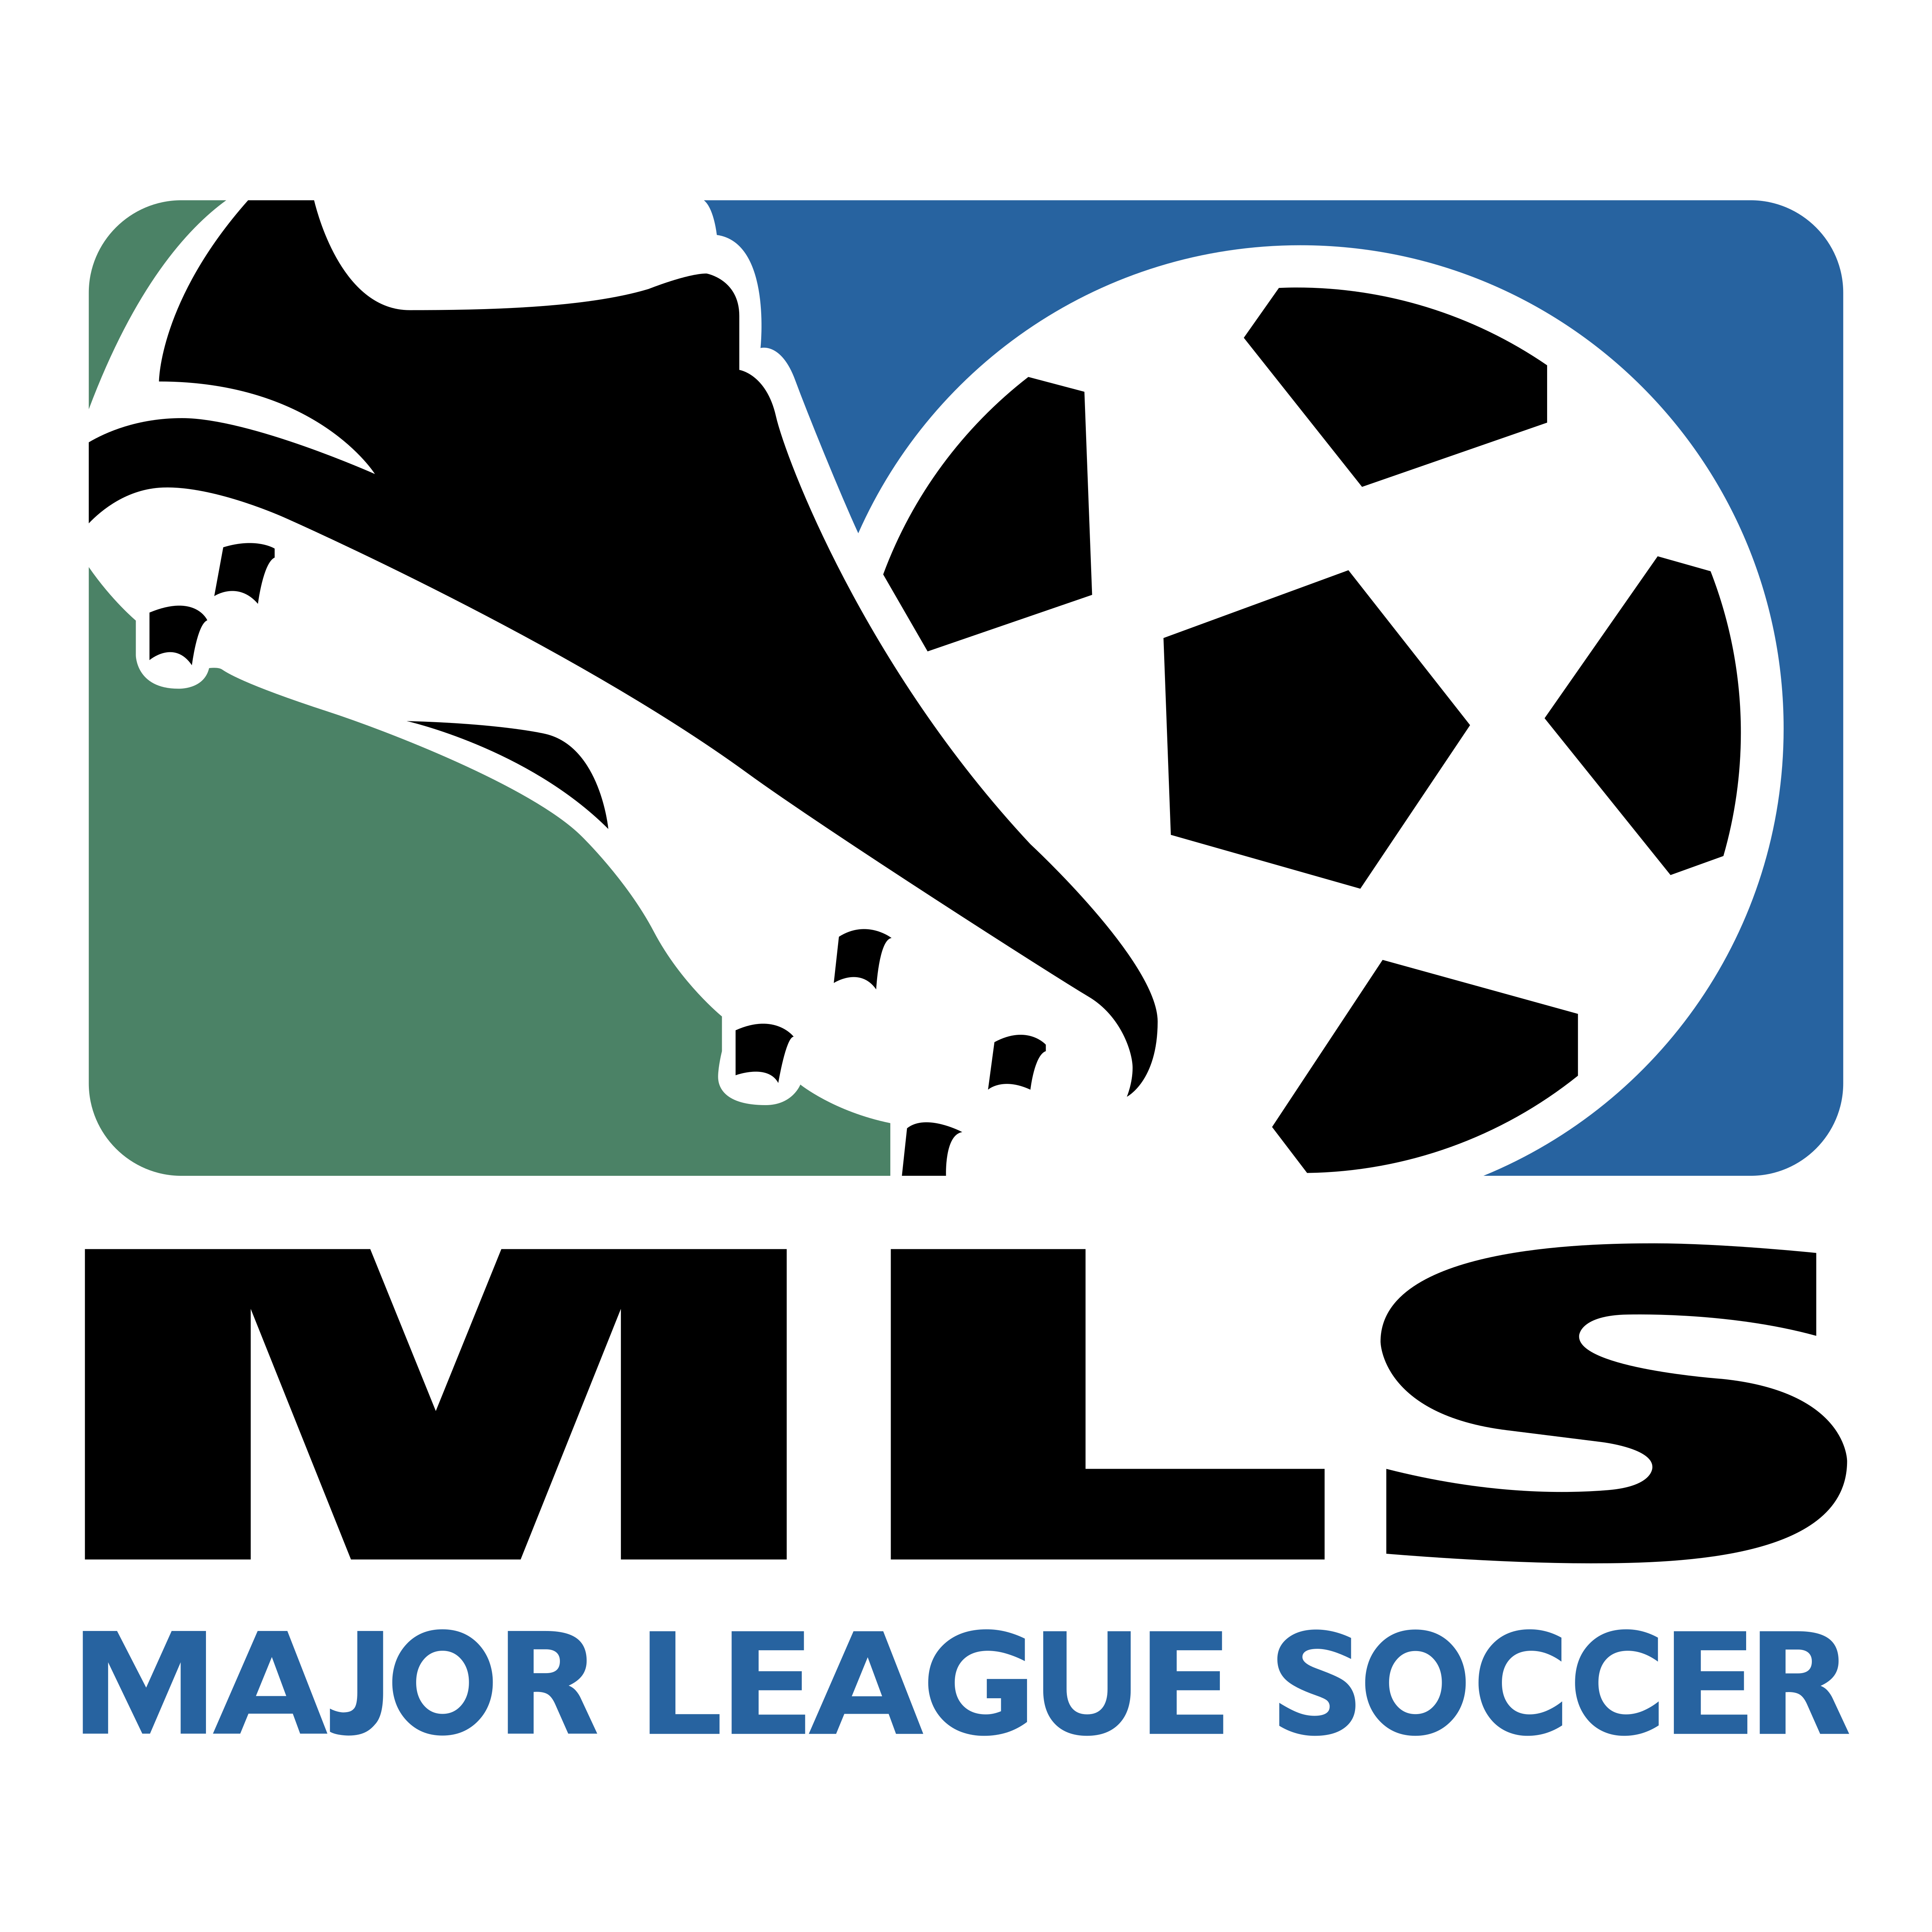 major league soccer logos download logos download